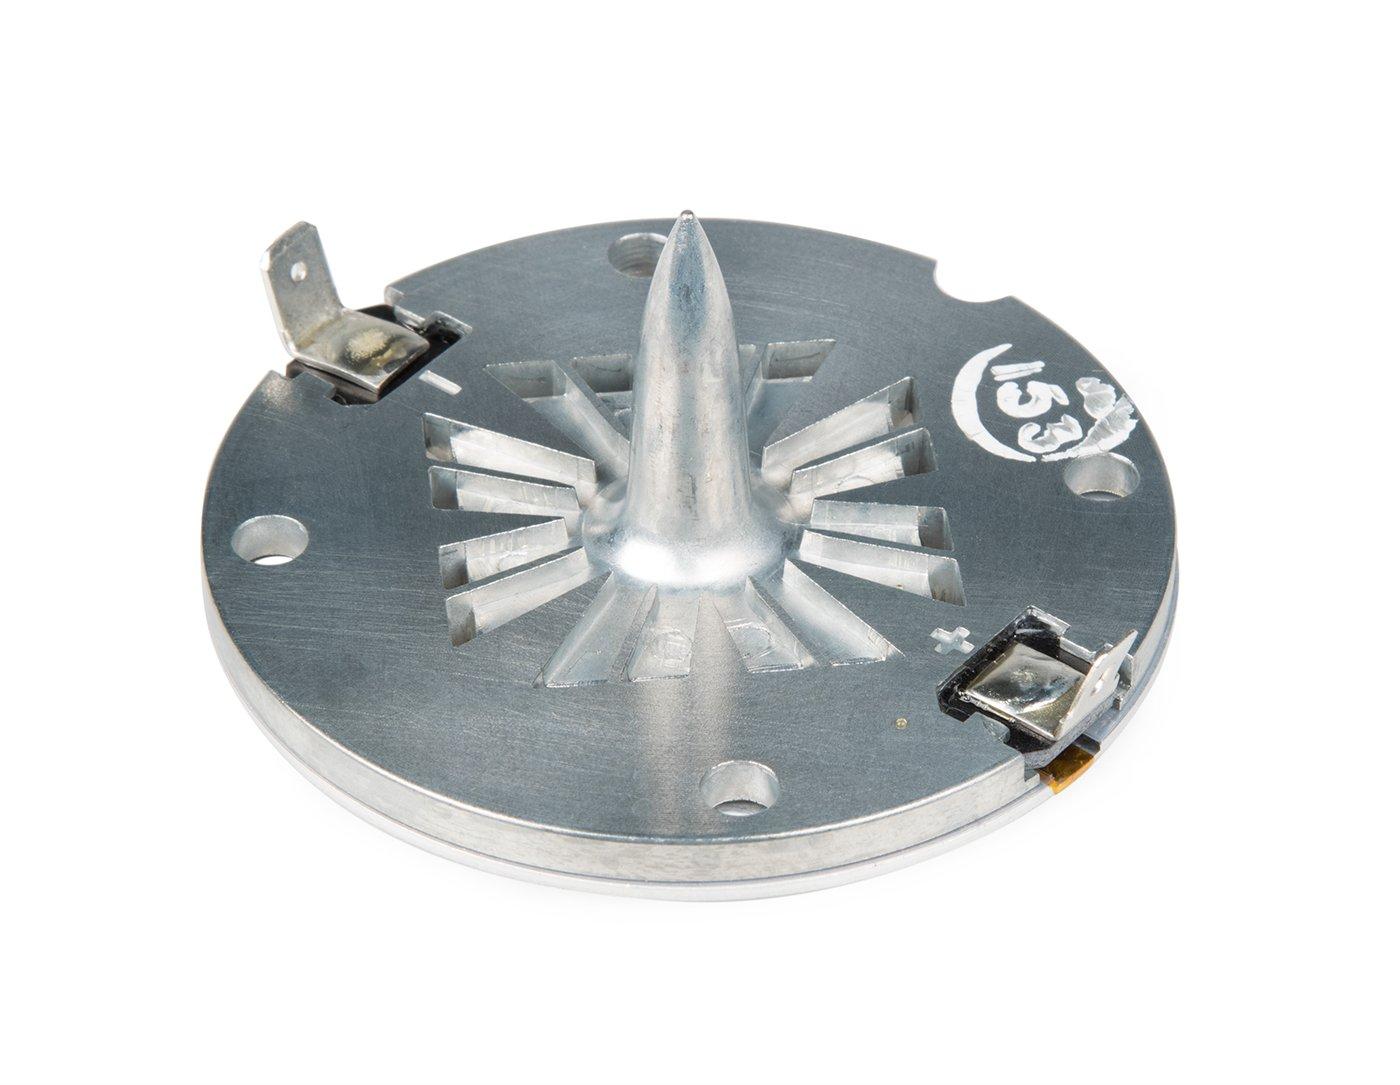 JBL D8R2408-1 2108H-1 Replacement Diaphragm | Full Compass